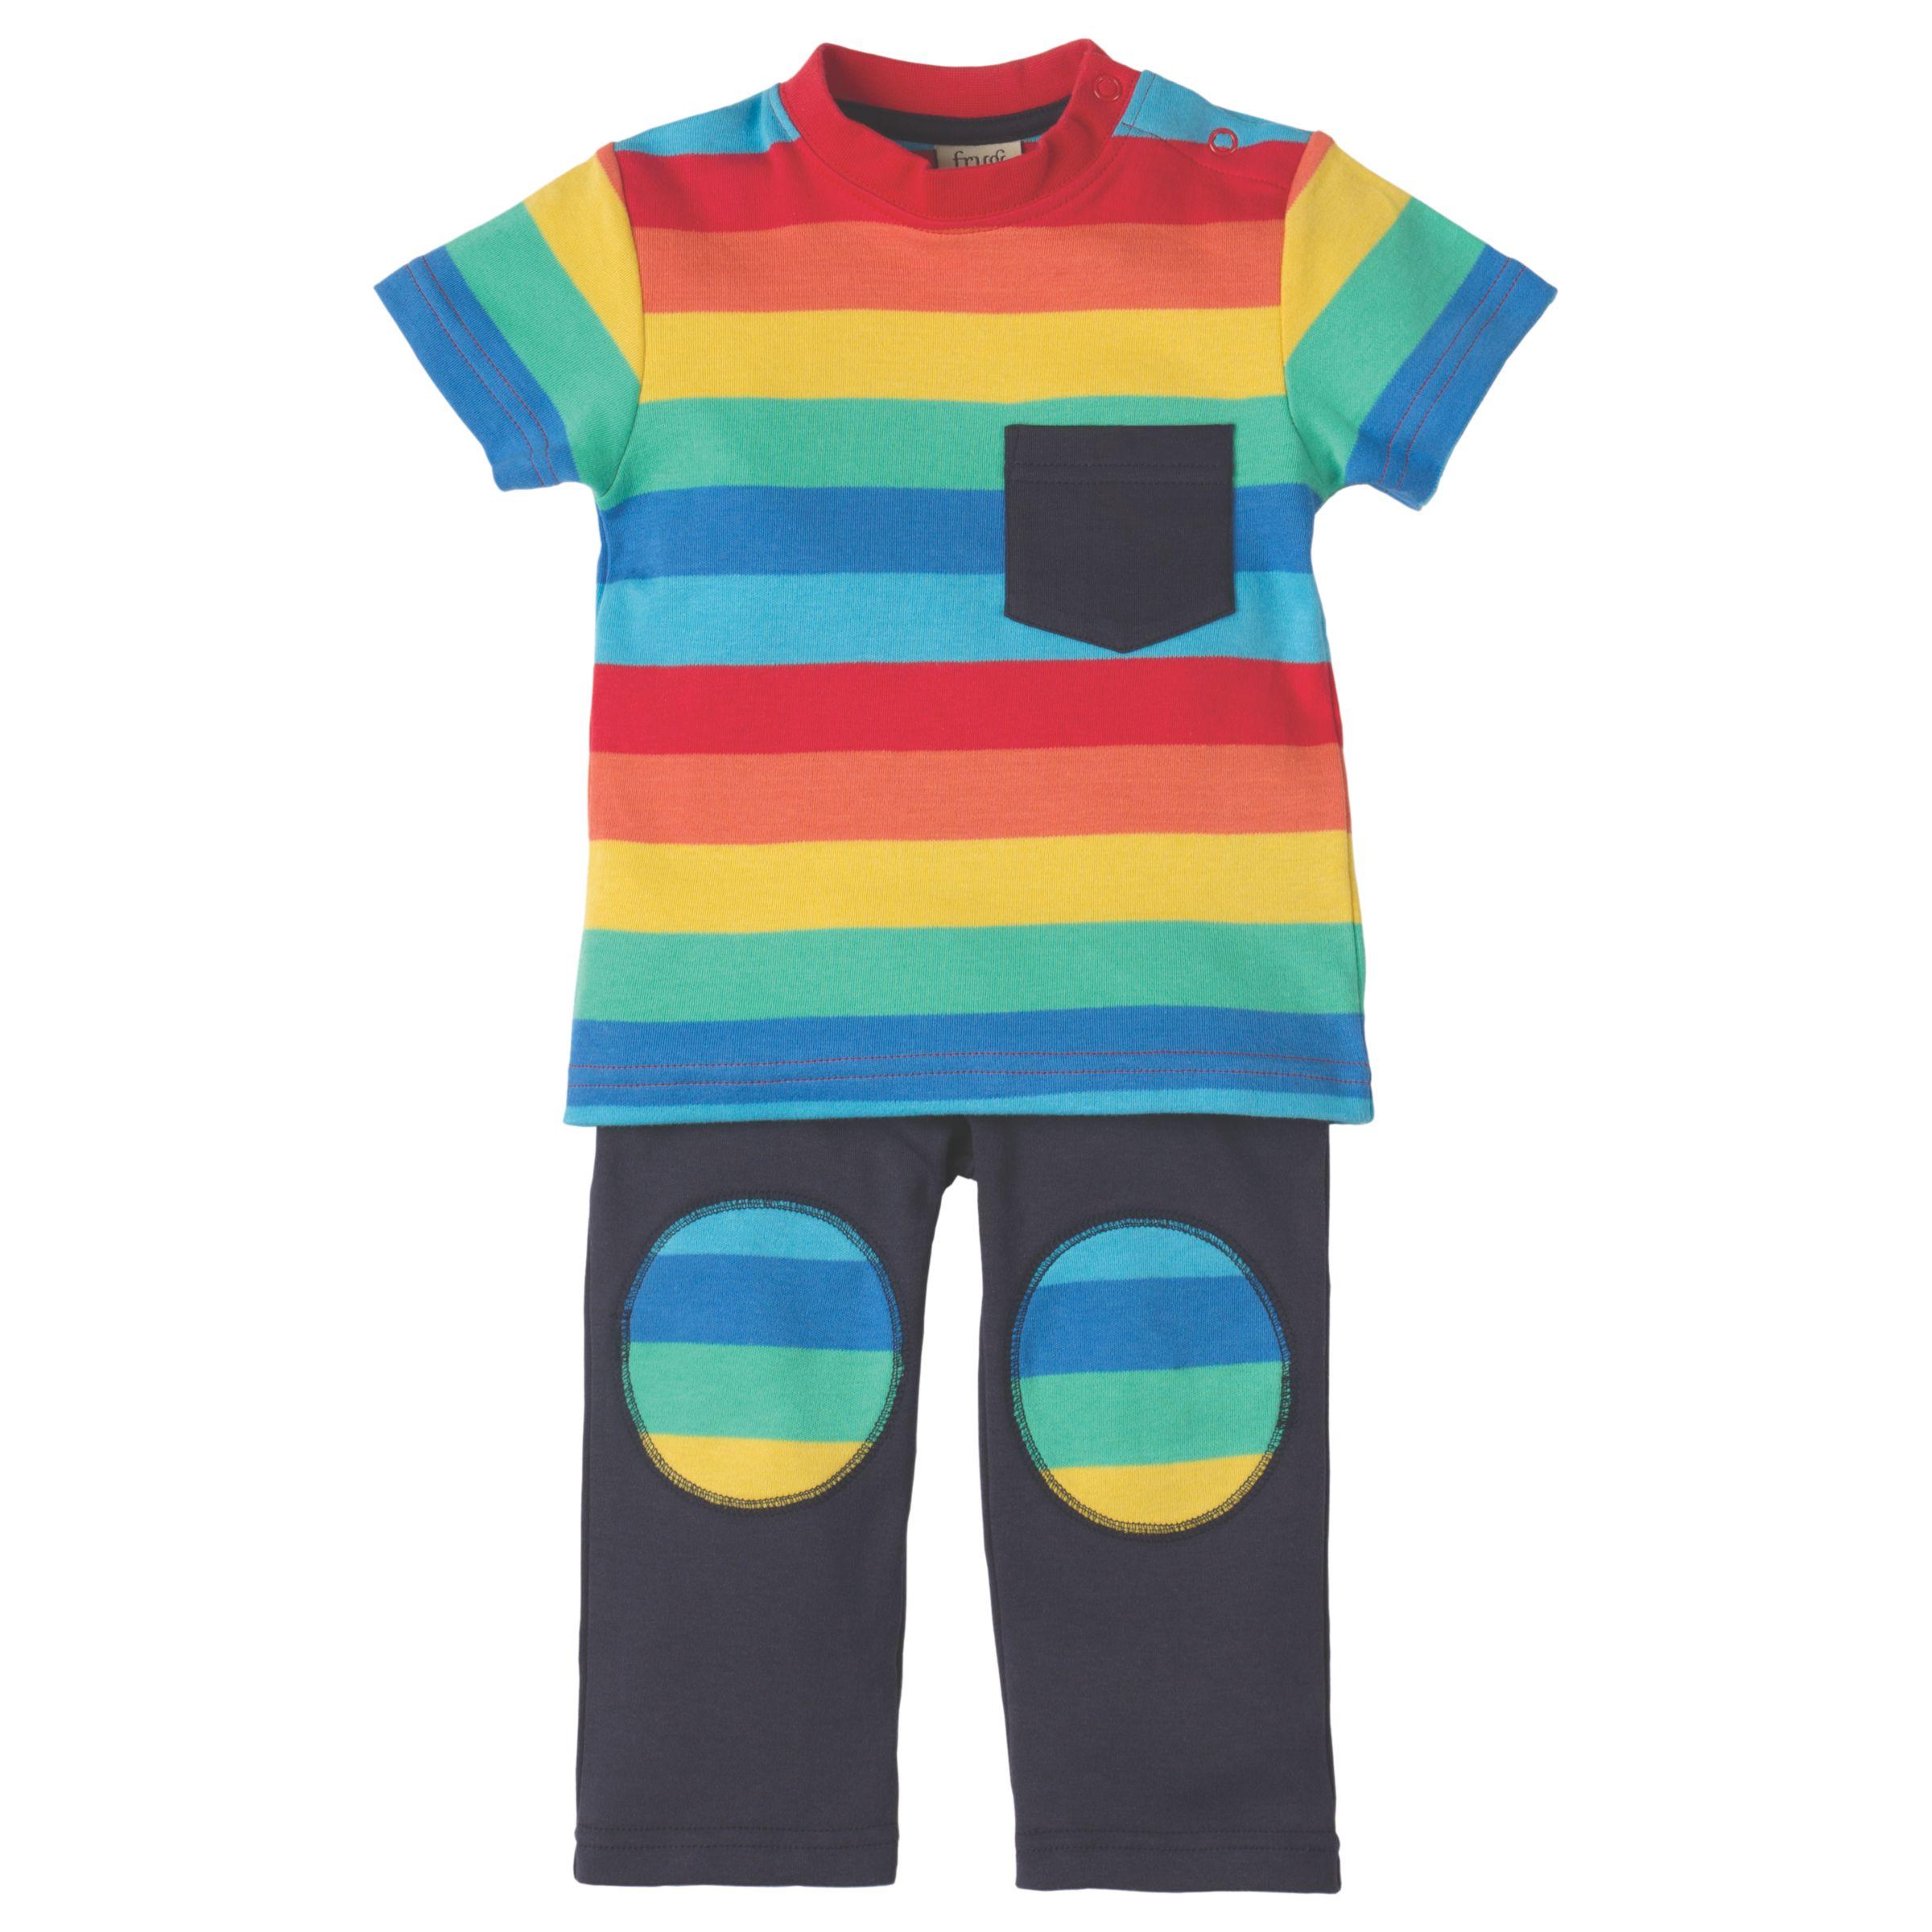 Frugi Organic Frugi Organic Baby Rainbow Play Day Outfit, Blue/Multi